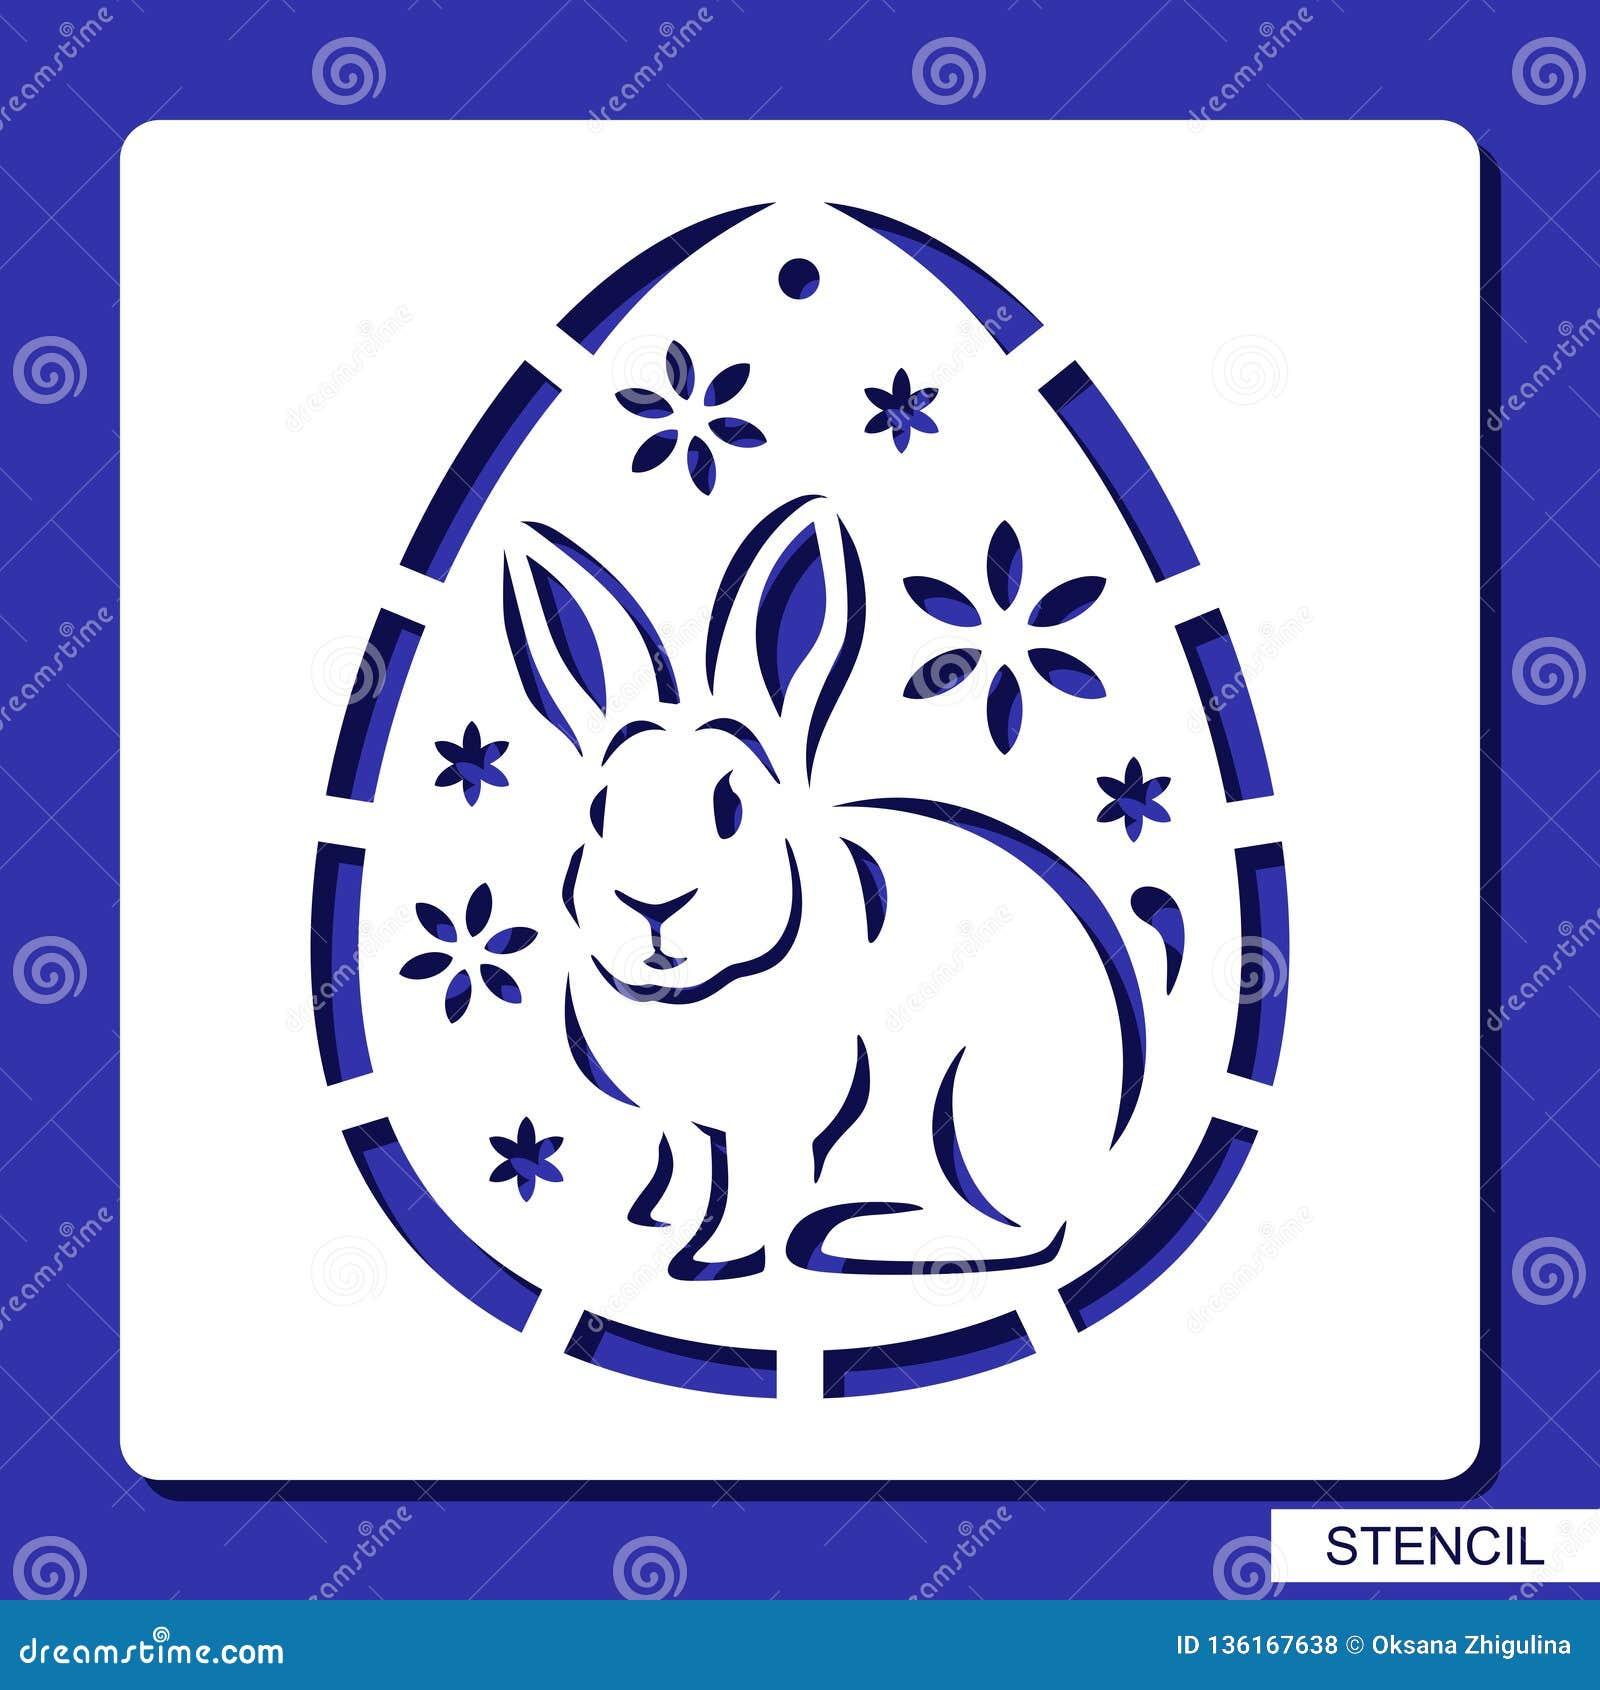 Stencil - Decorative Easter Egg. Stock Illustration ...